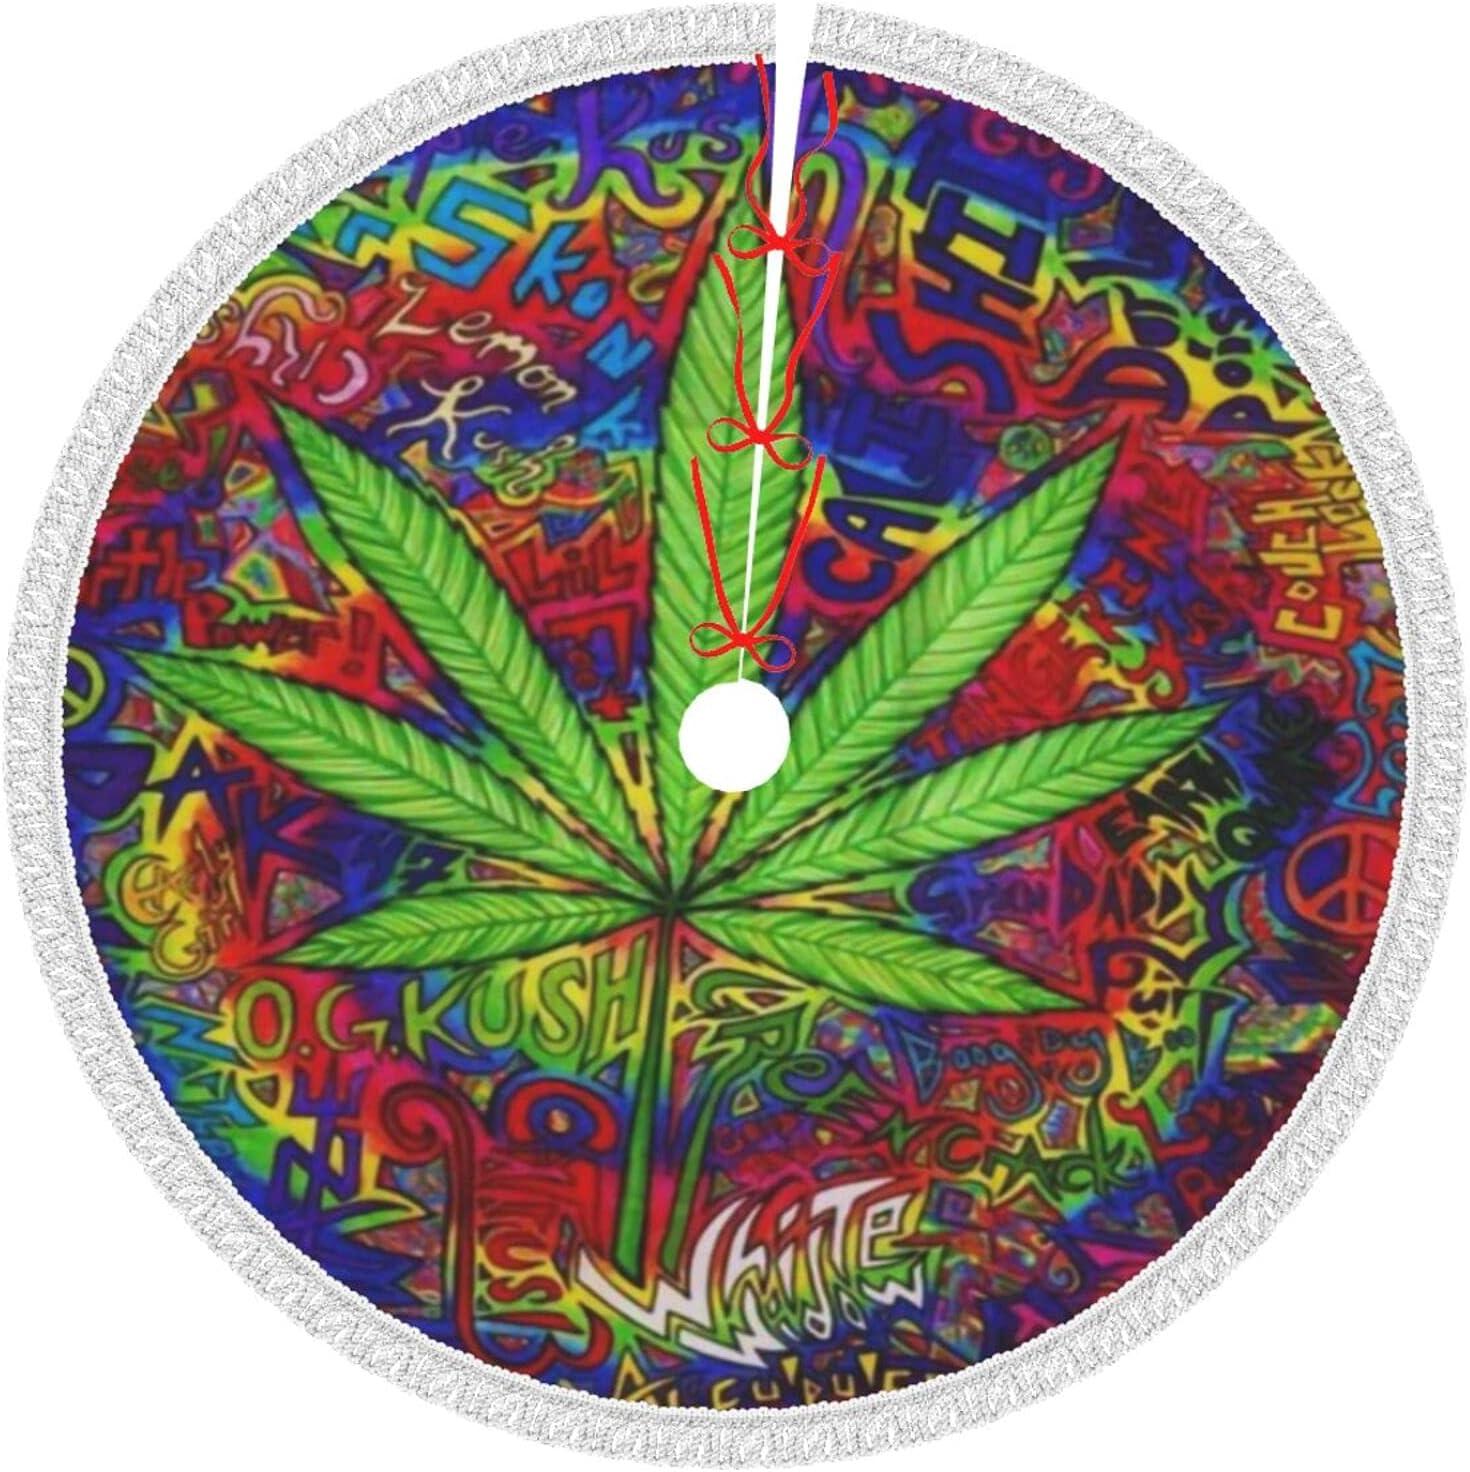 Psychedelic Marijuana Leaf Weed Max 81% OFF Tie Or Tree Dye Skirt Max 79% OFF Christmas